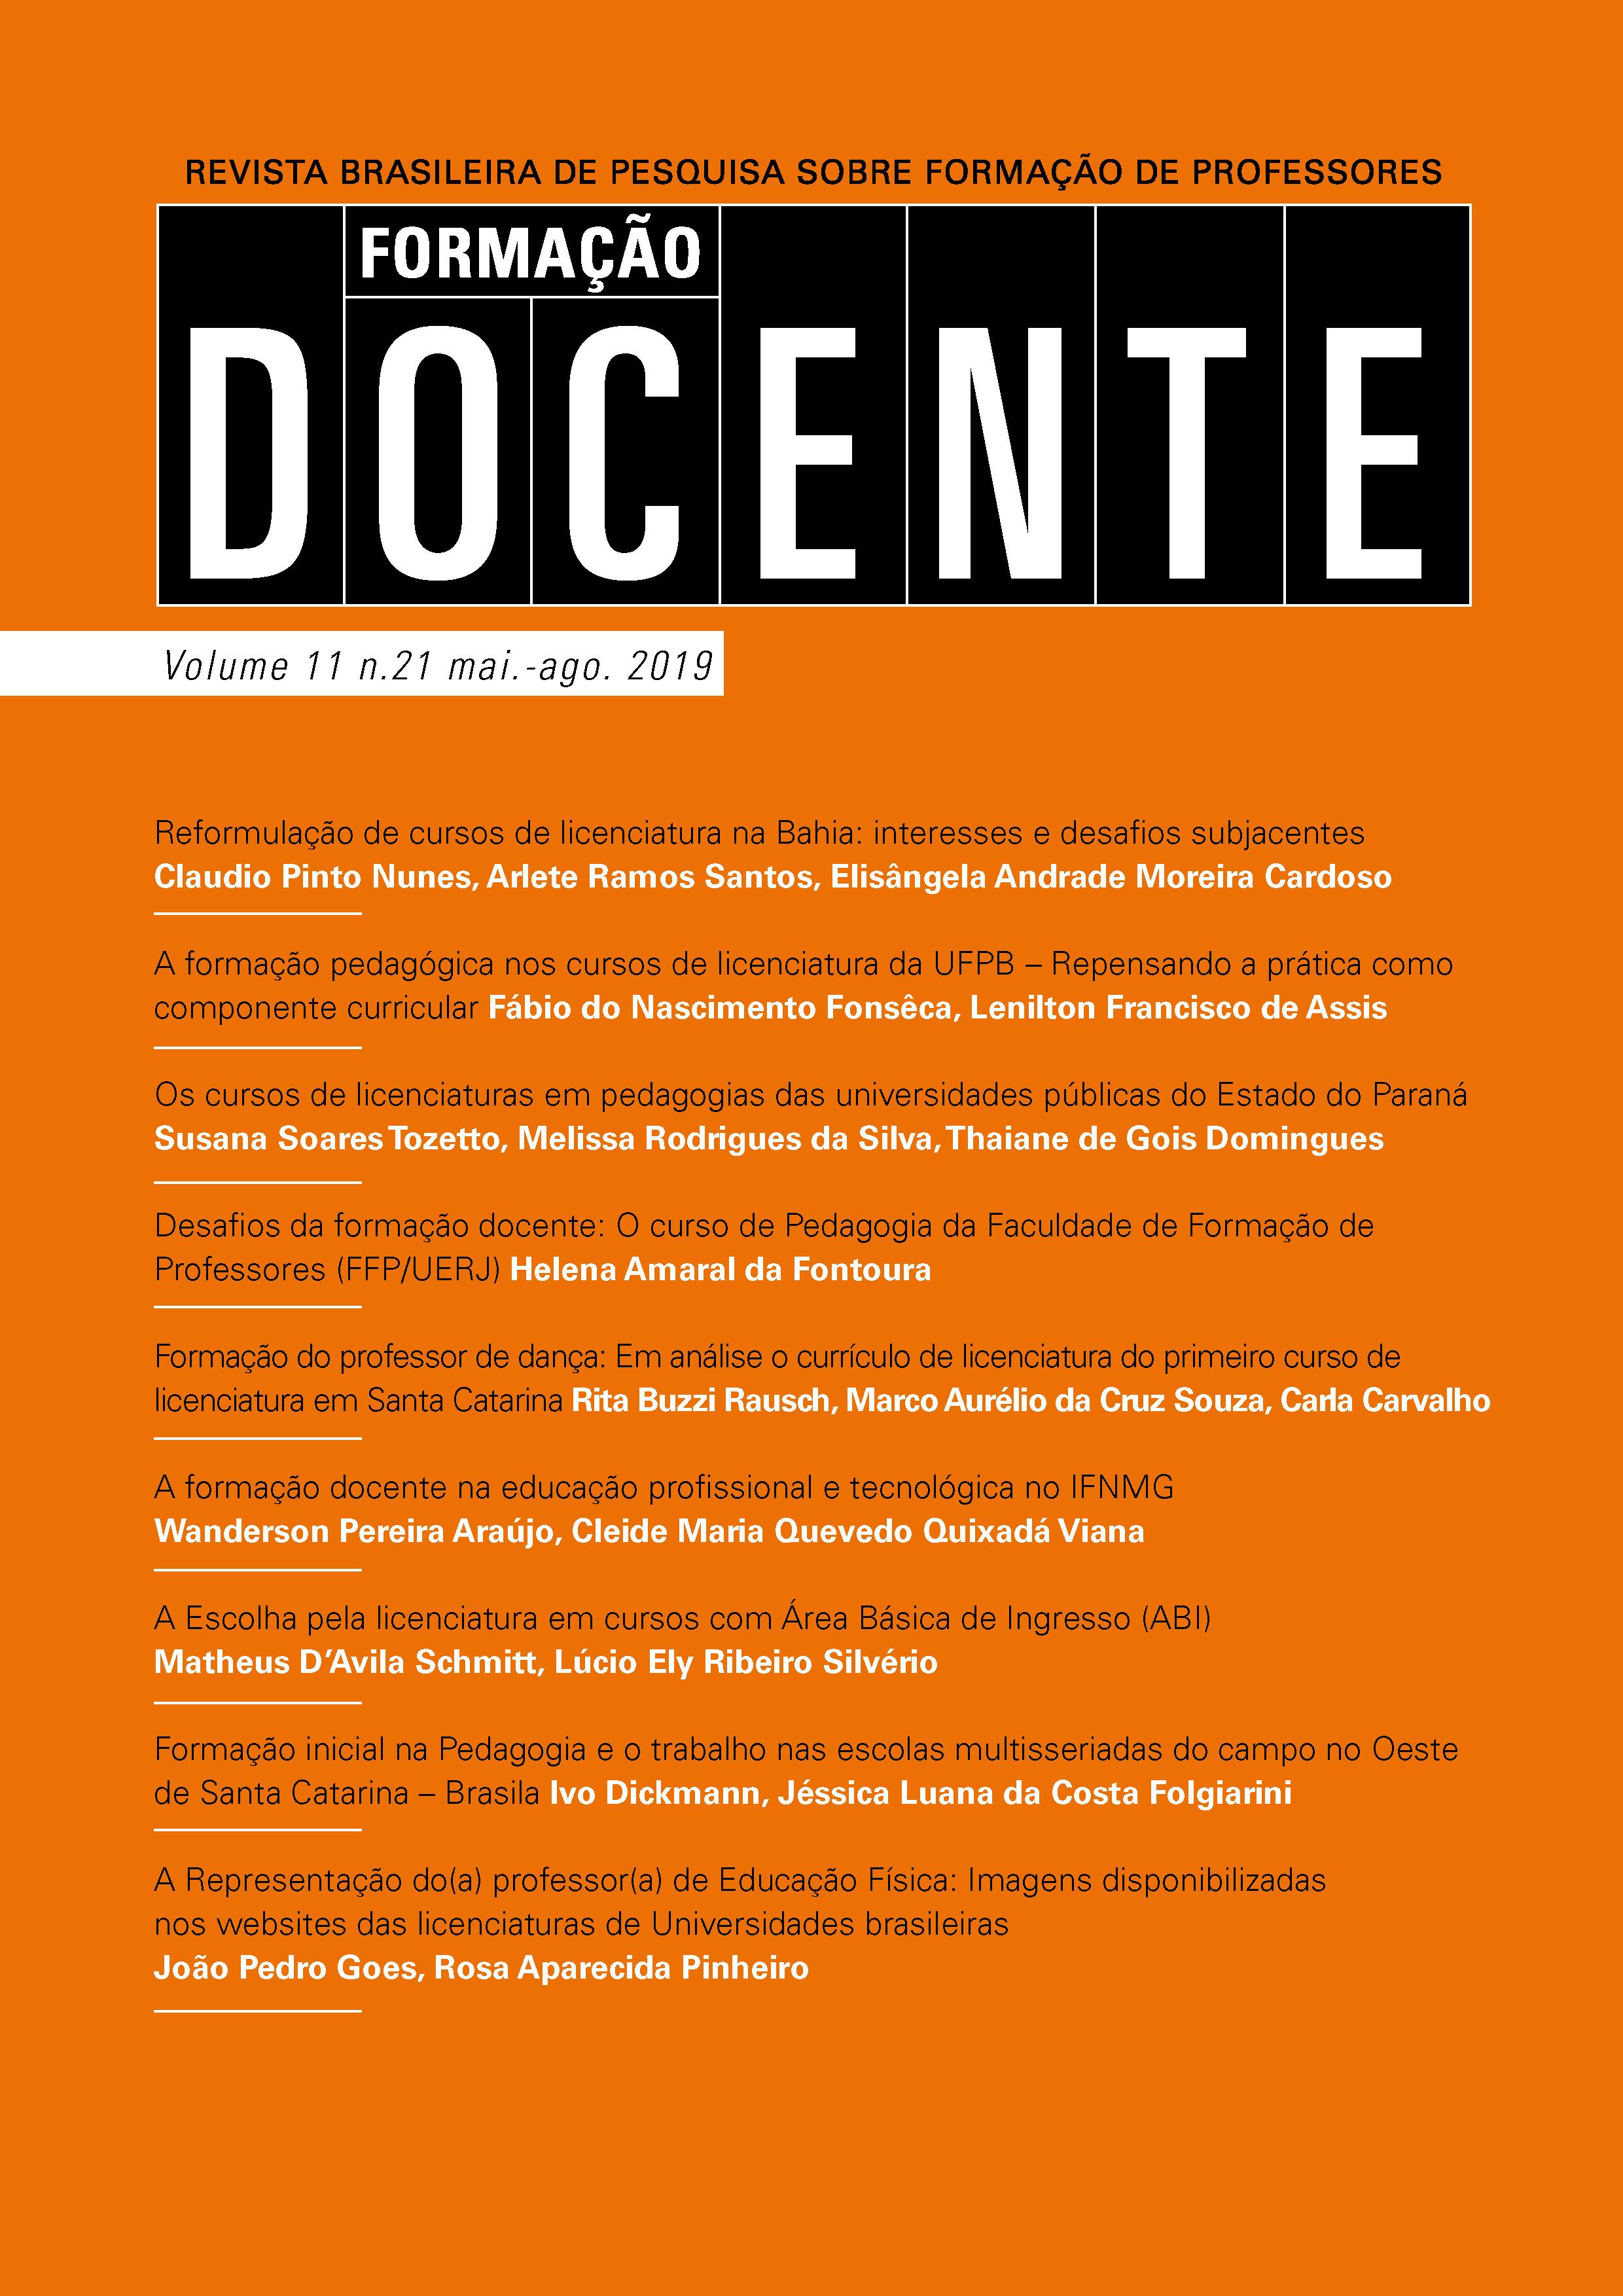 Volume 11, n. 21, maio / agosto de 2019